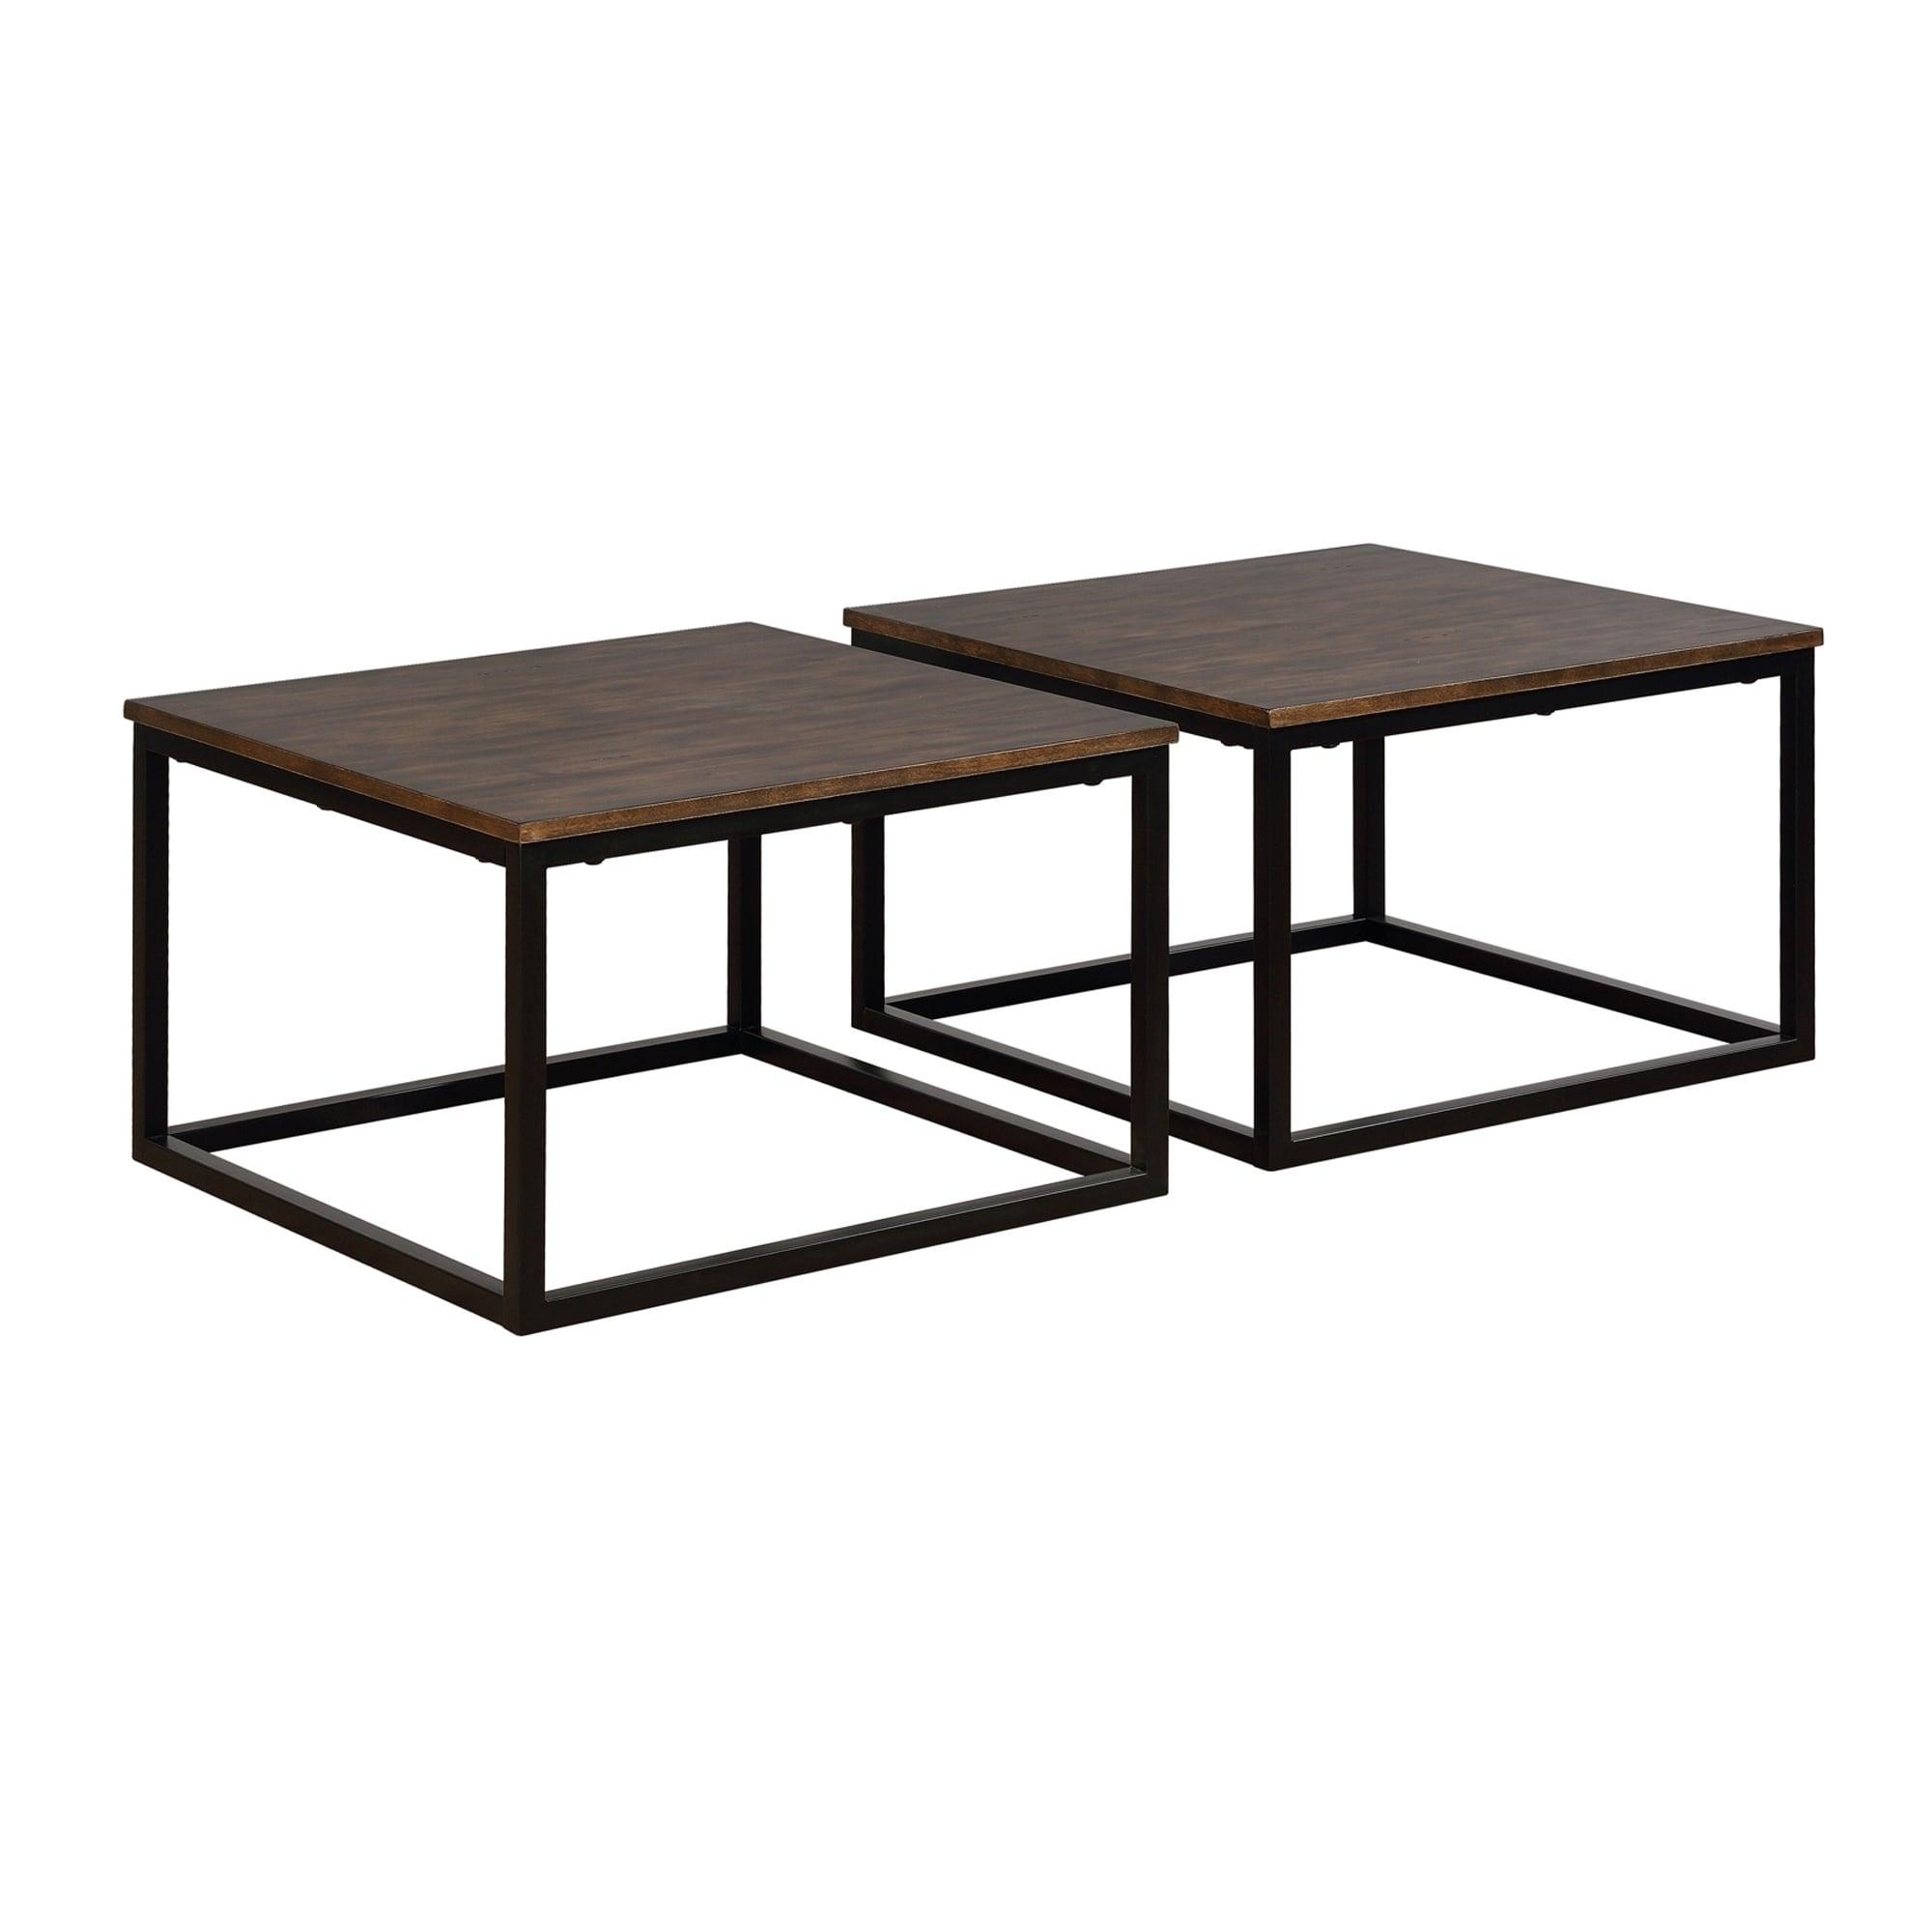 Arcadia Acacia Wood Square Coffee Tables Set Of 2